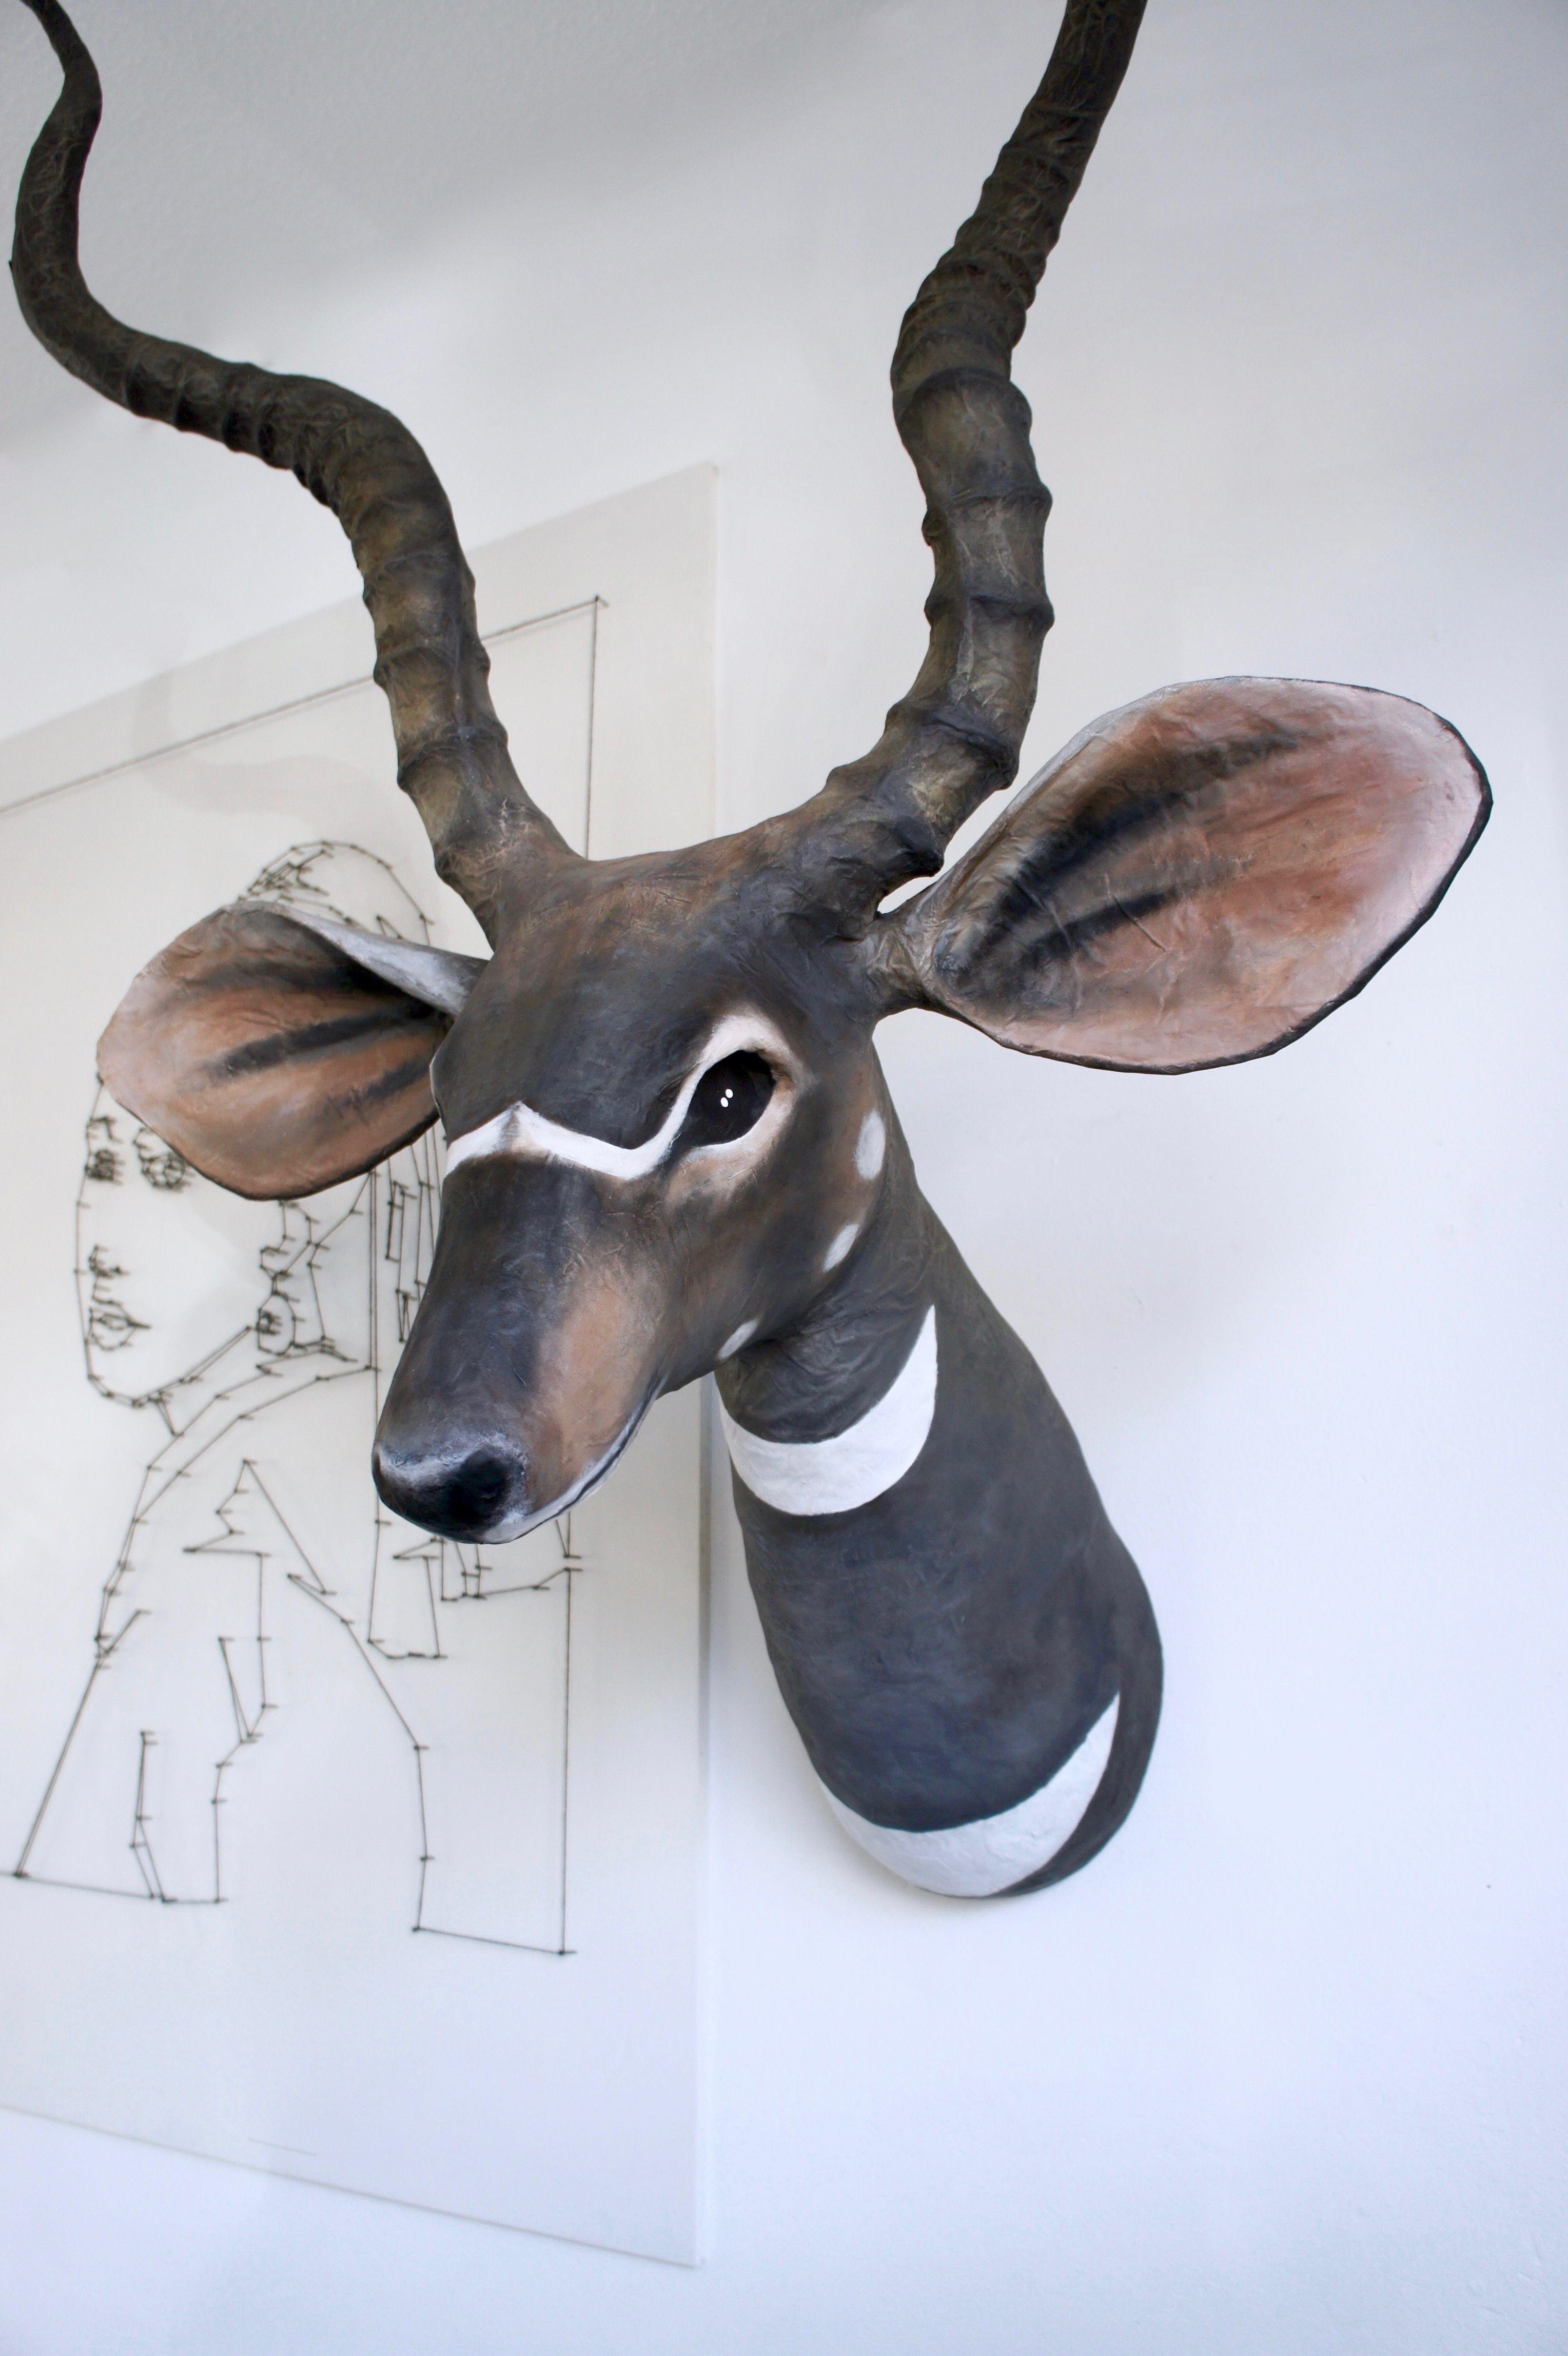 Papercraft Deer K U D U Made Of Paper Maché Made by Susan Meijerink Kudu forsale